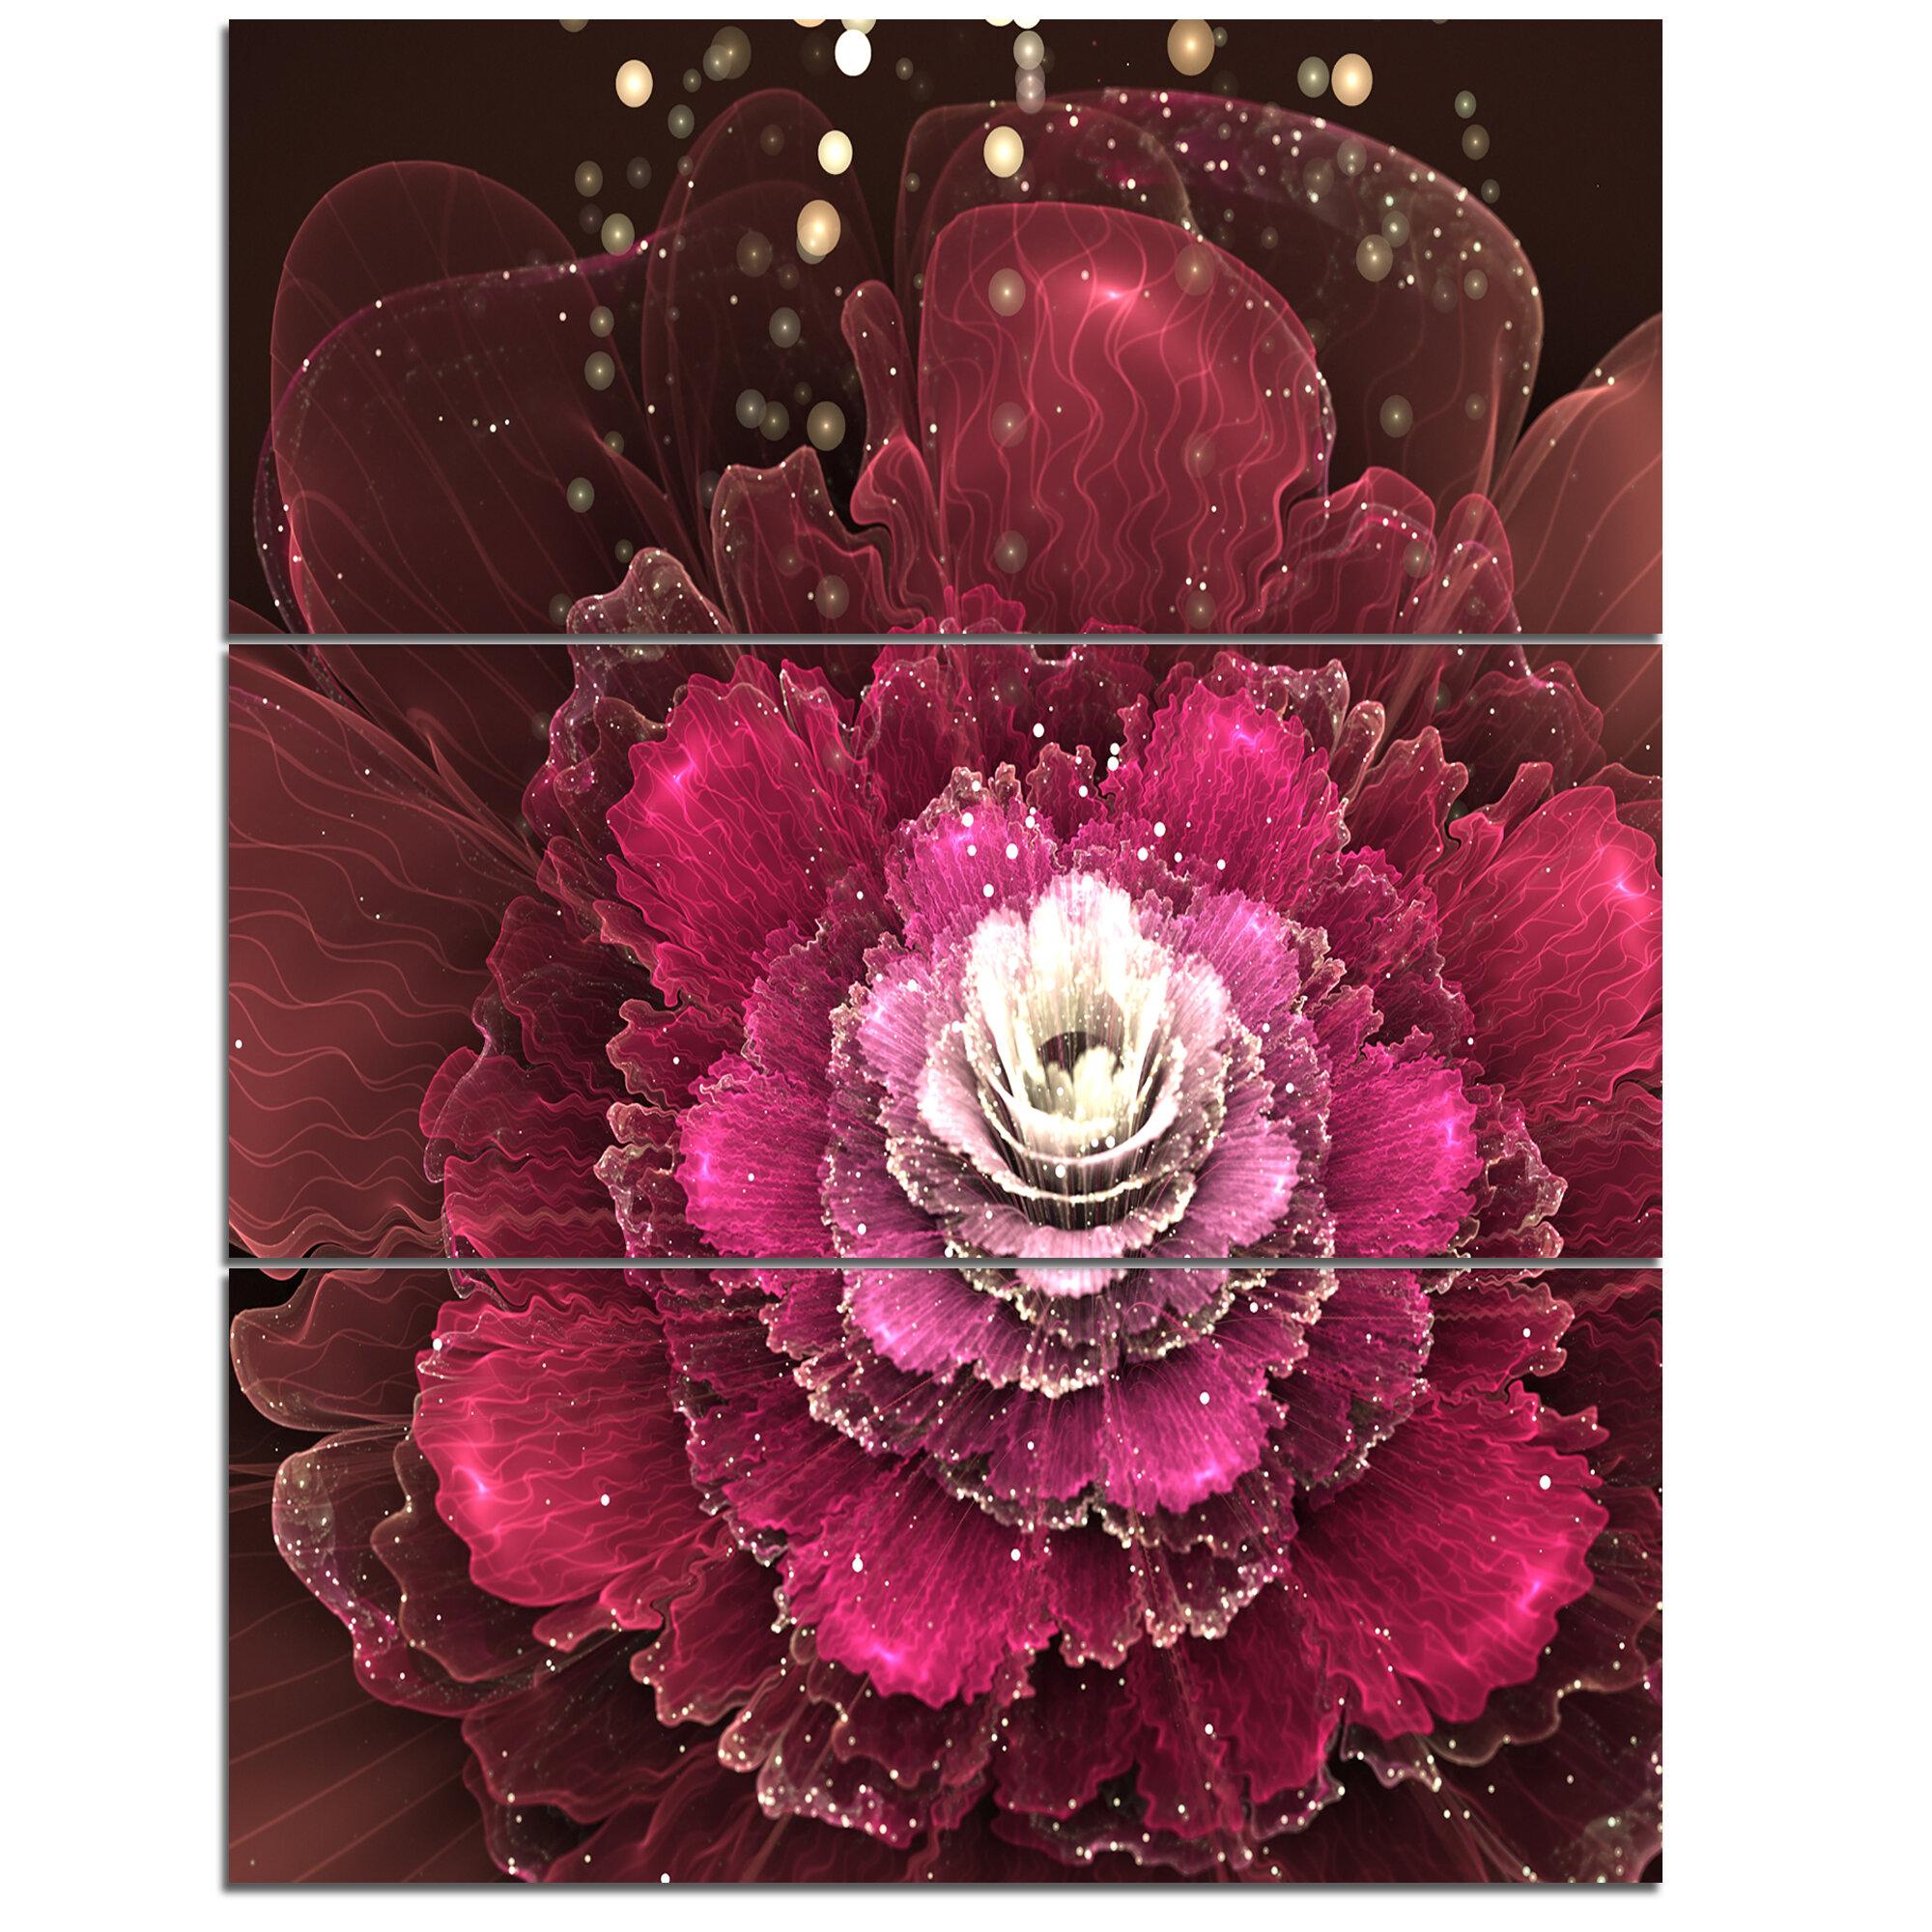 Designart Fractal Red Rose Flower 3 Piece Graphic Art On Wrapped Canvas Set Wayfair